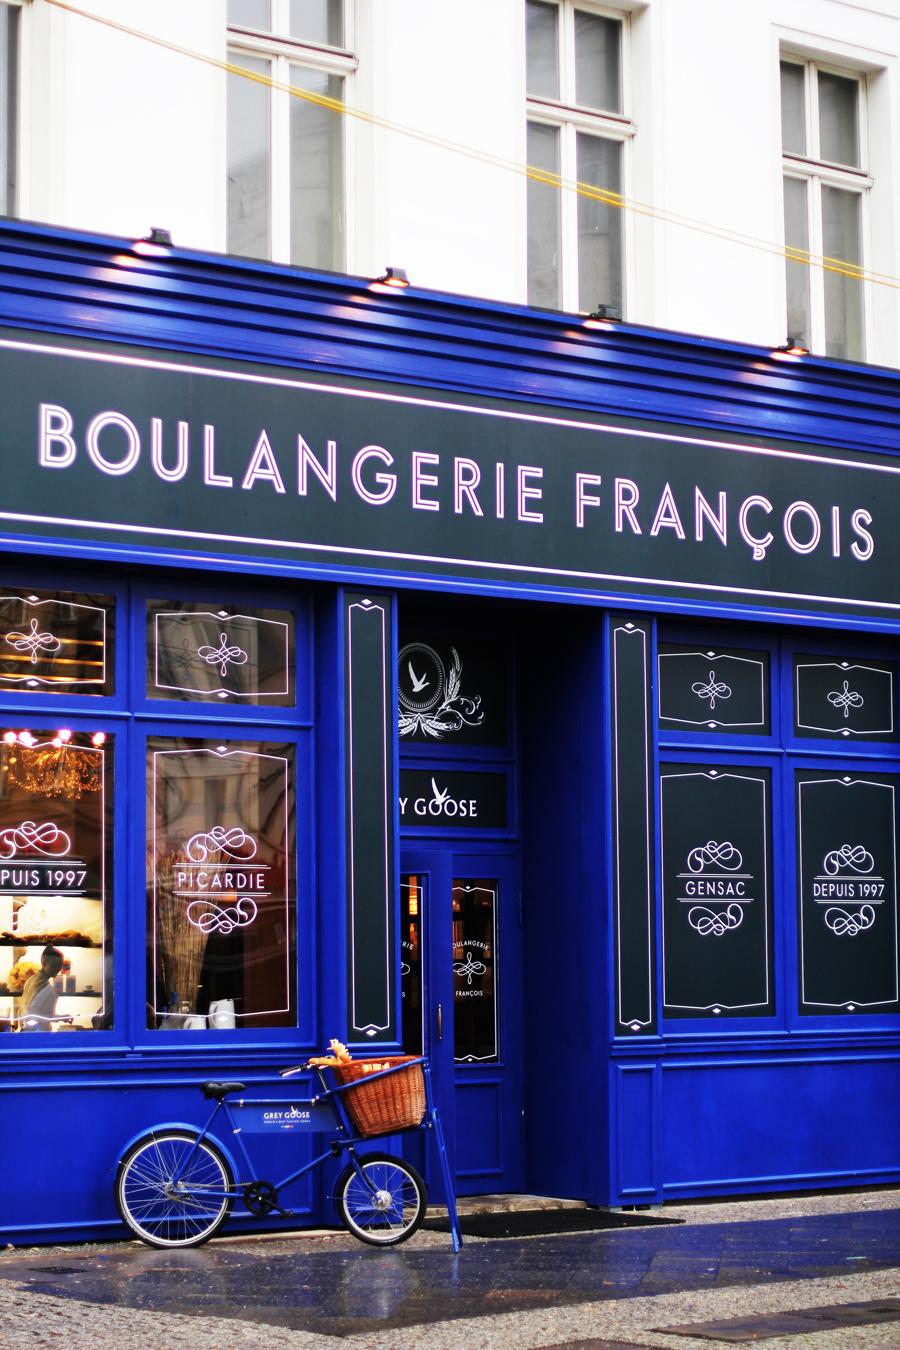 boulangerie francois